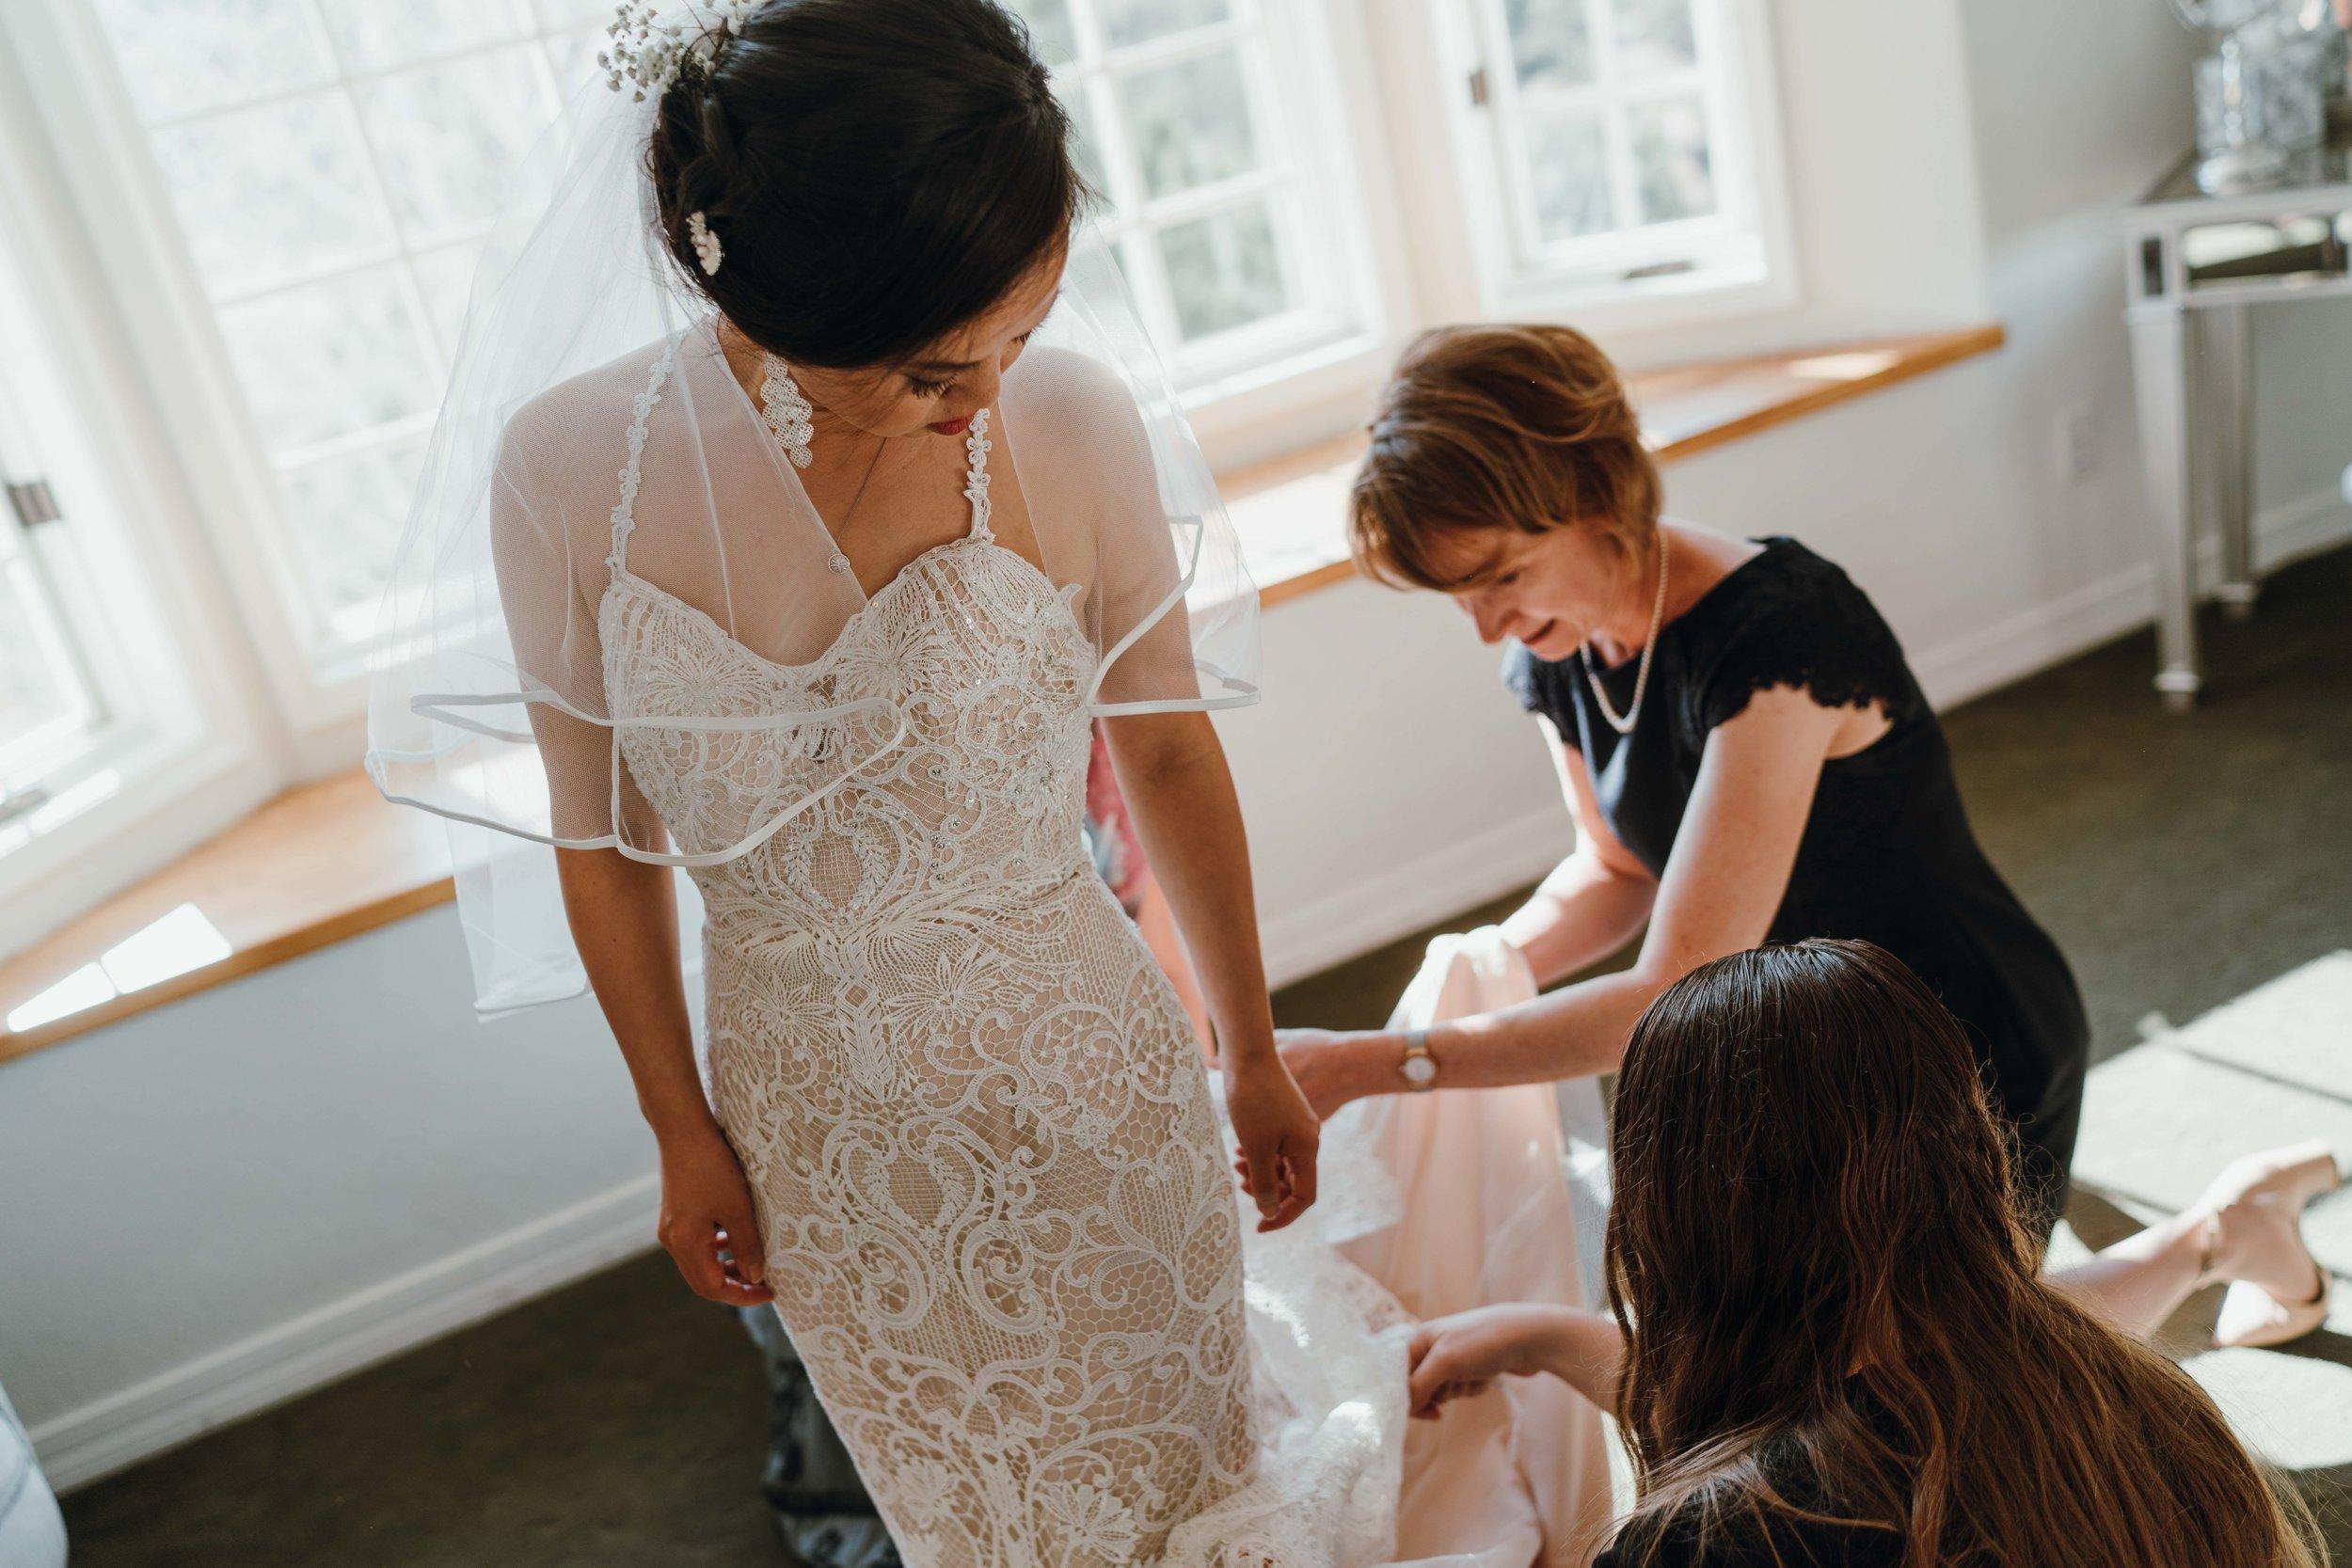 denver wedding photographer lioncrest manor in lyons ben and mali -DSC06223.jpg